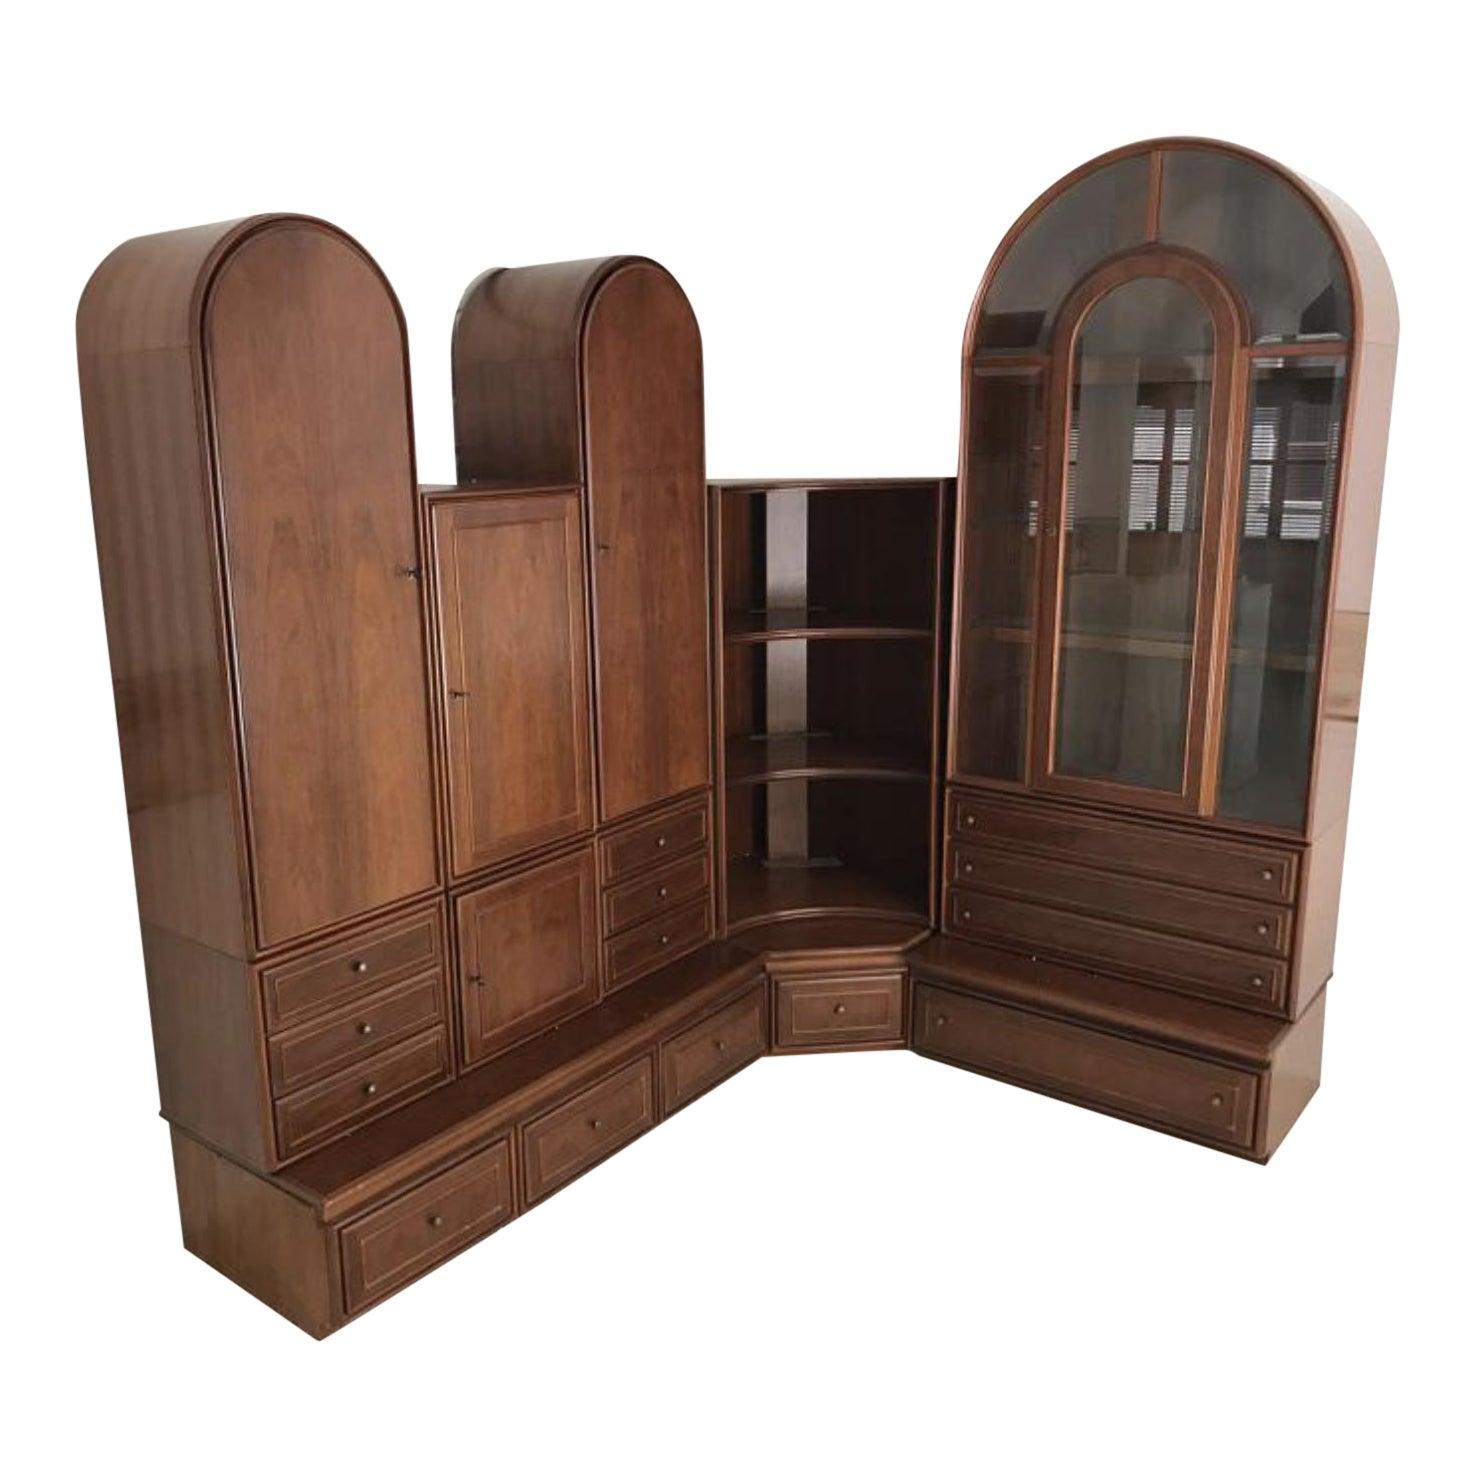 Impresssive walnut modular corner cabinets chairish